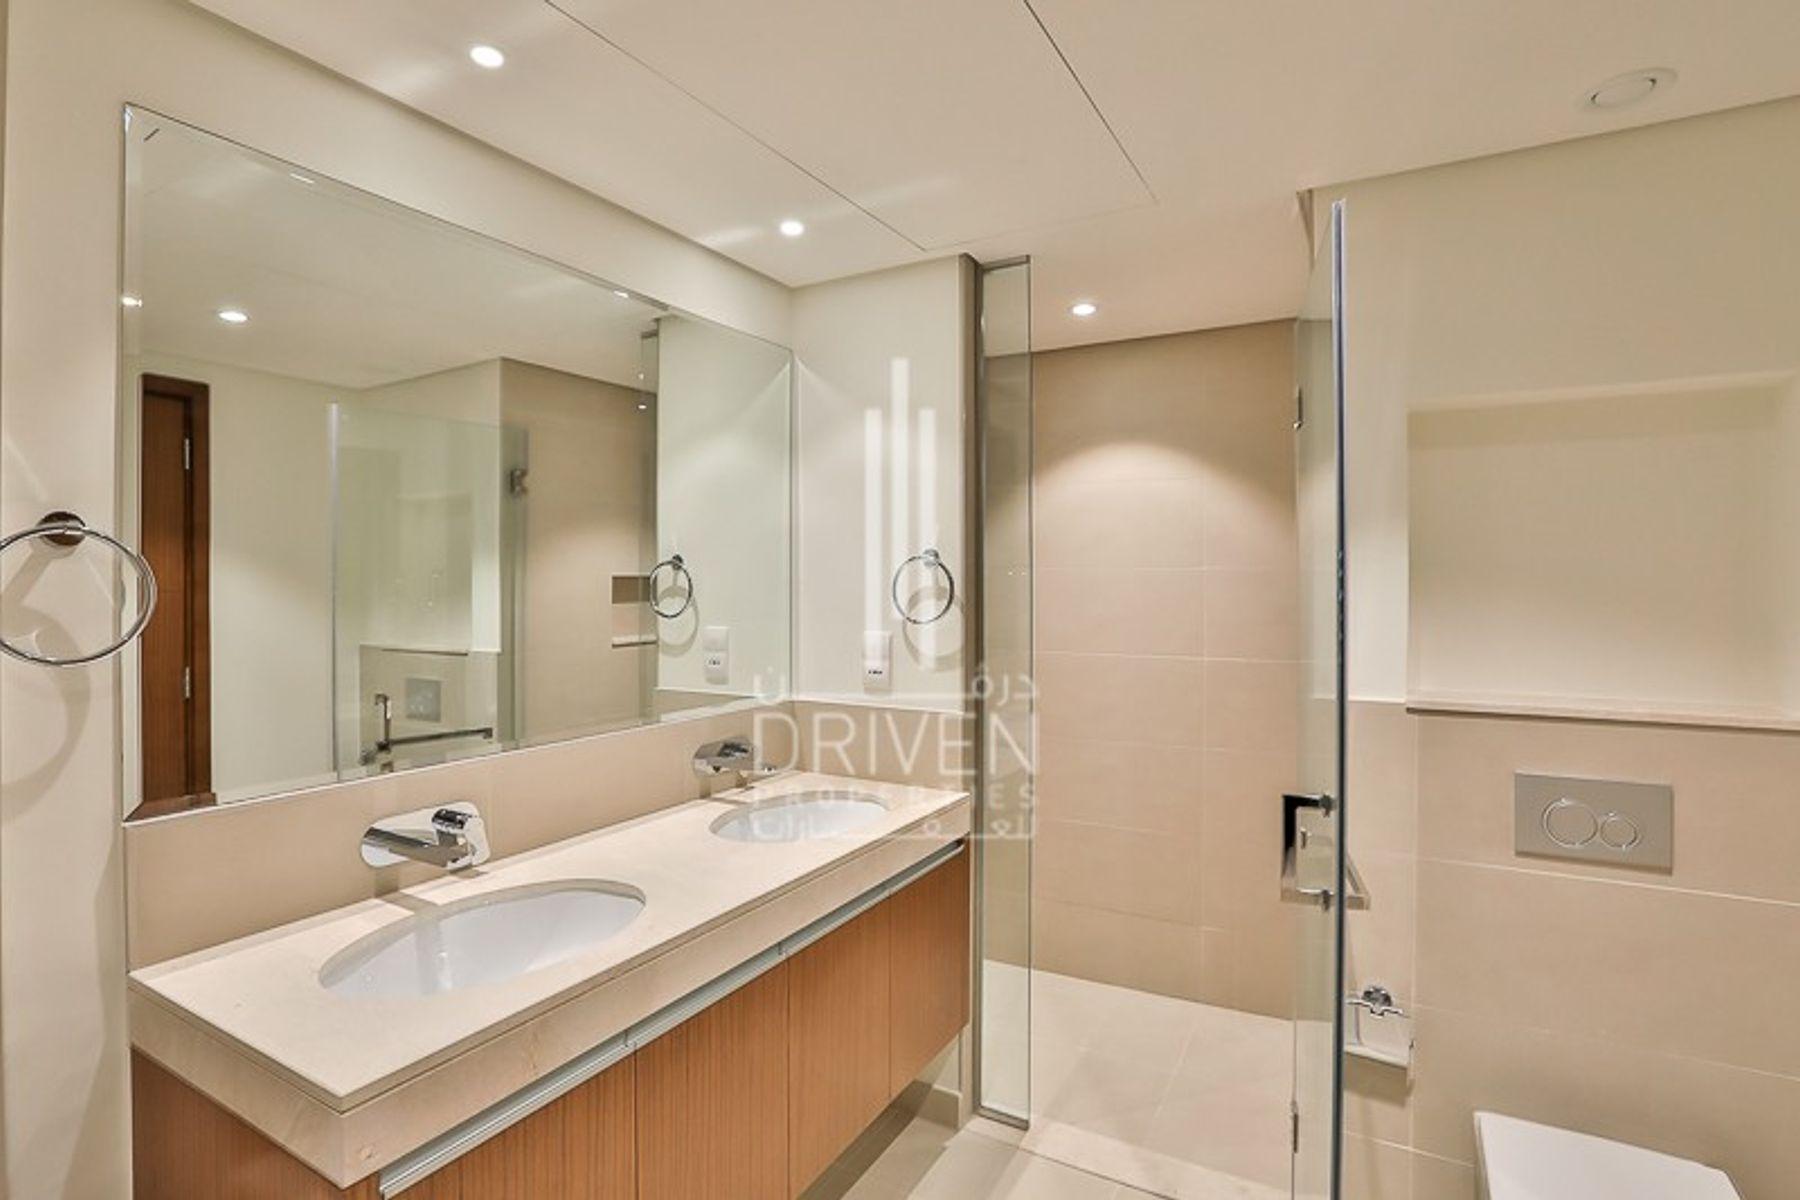 Apartment for Sale in Dubai Creek Residence Tower 1 South - Dubai Creek Harbour